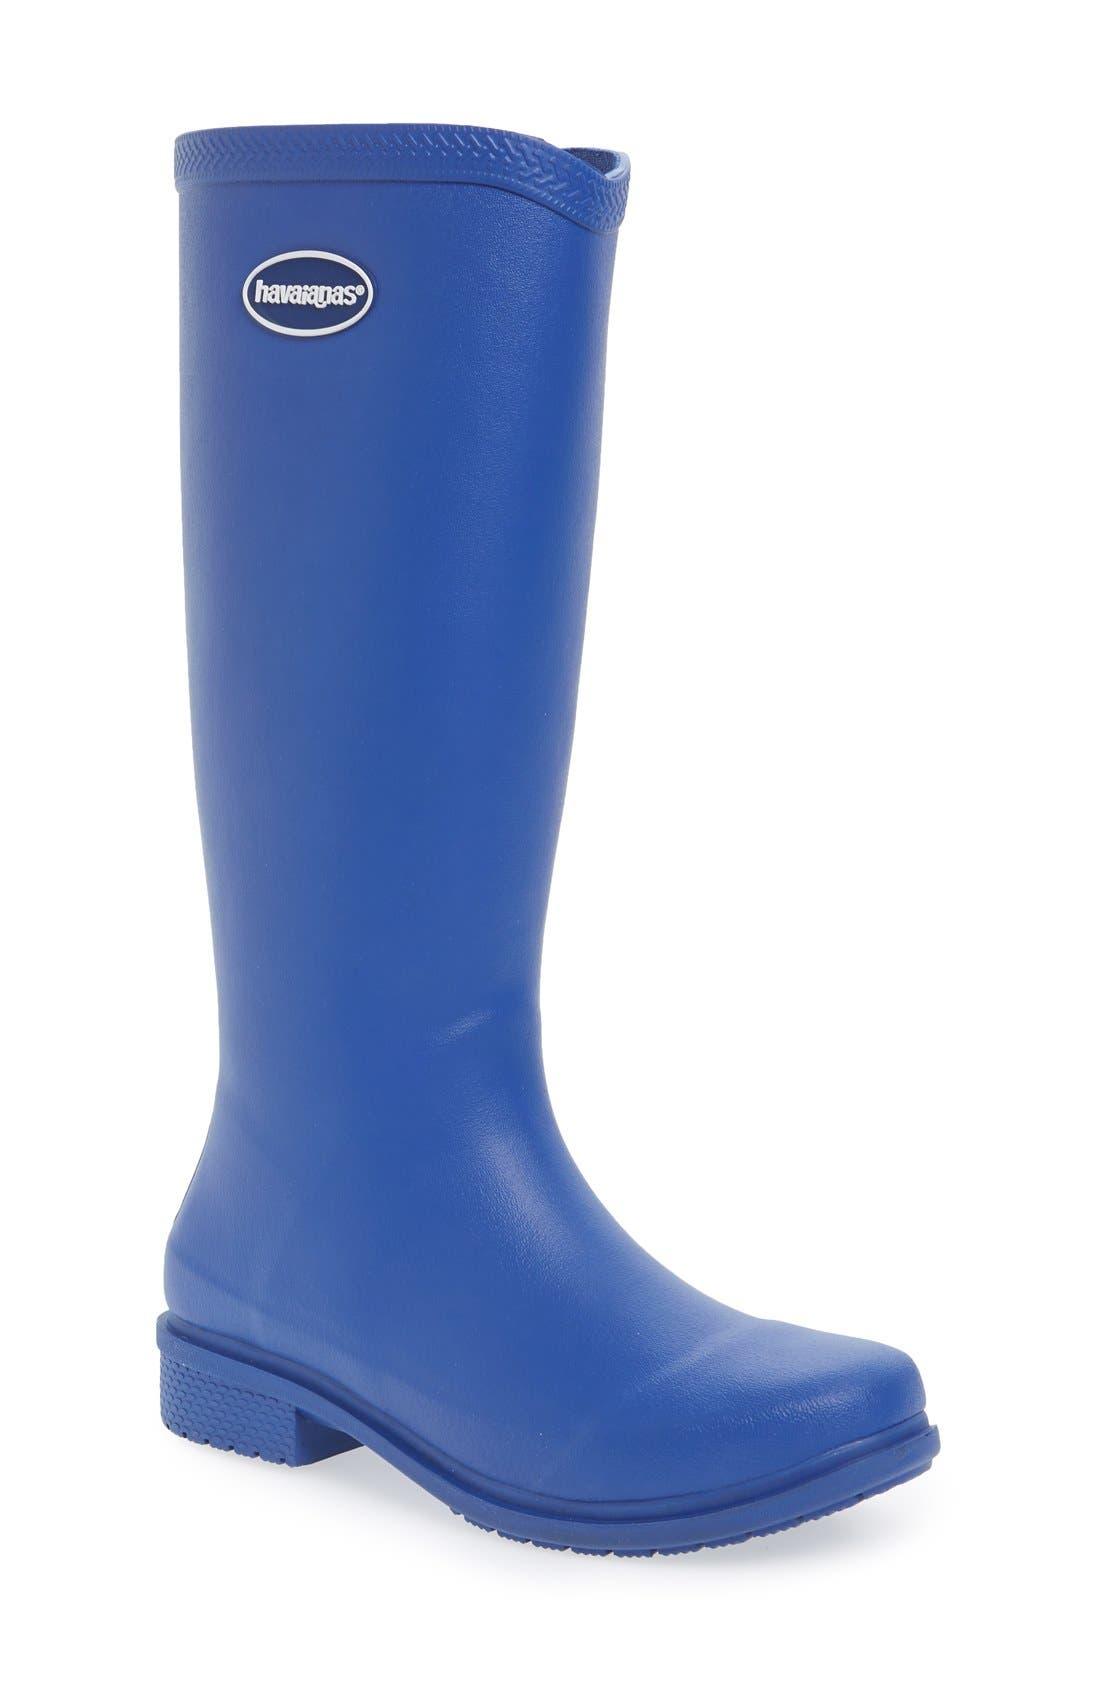 HAVAIANAS 'Galochas Hi Matte' Waterproof Rain Boot, Marine Blue